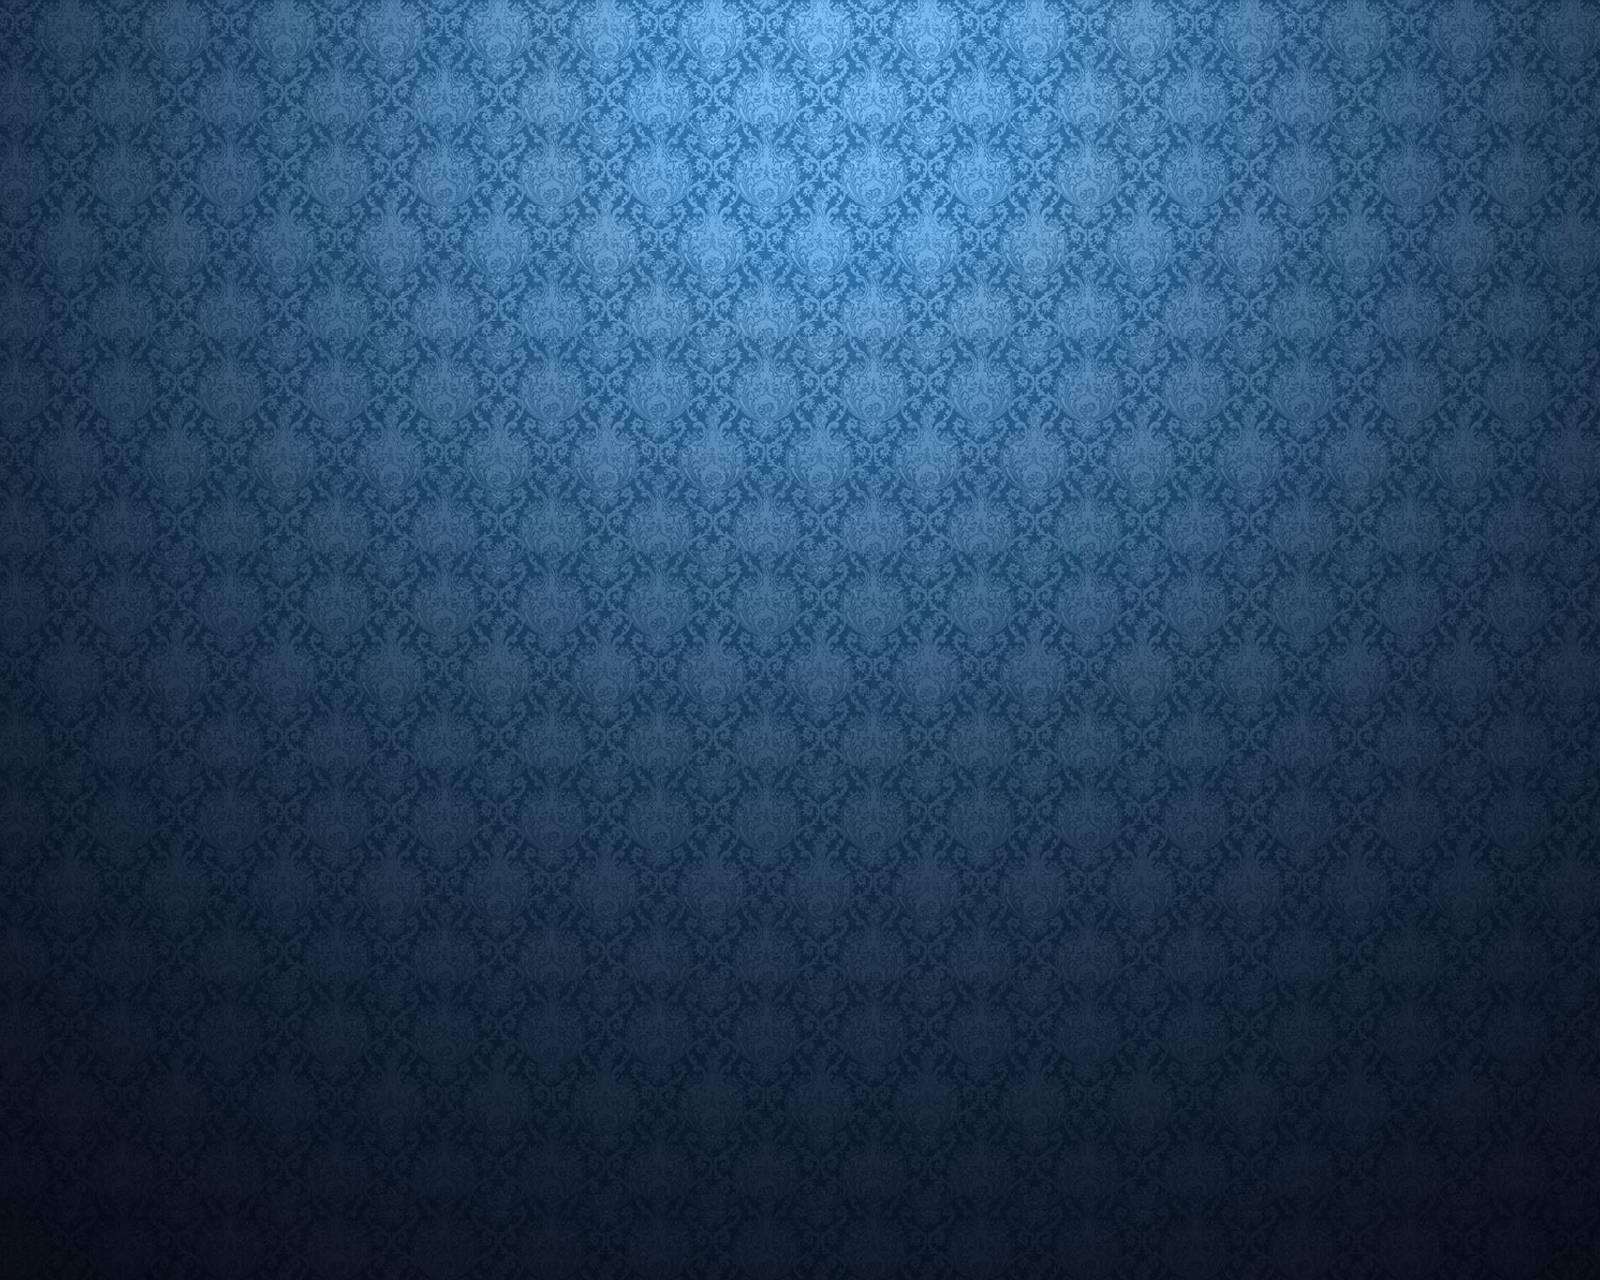 Blue Patern